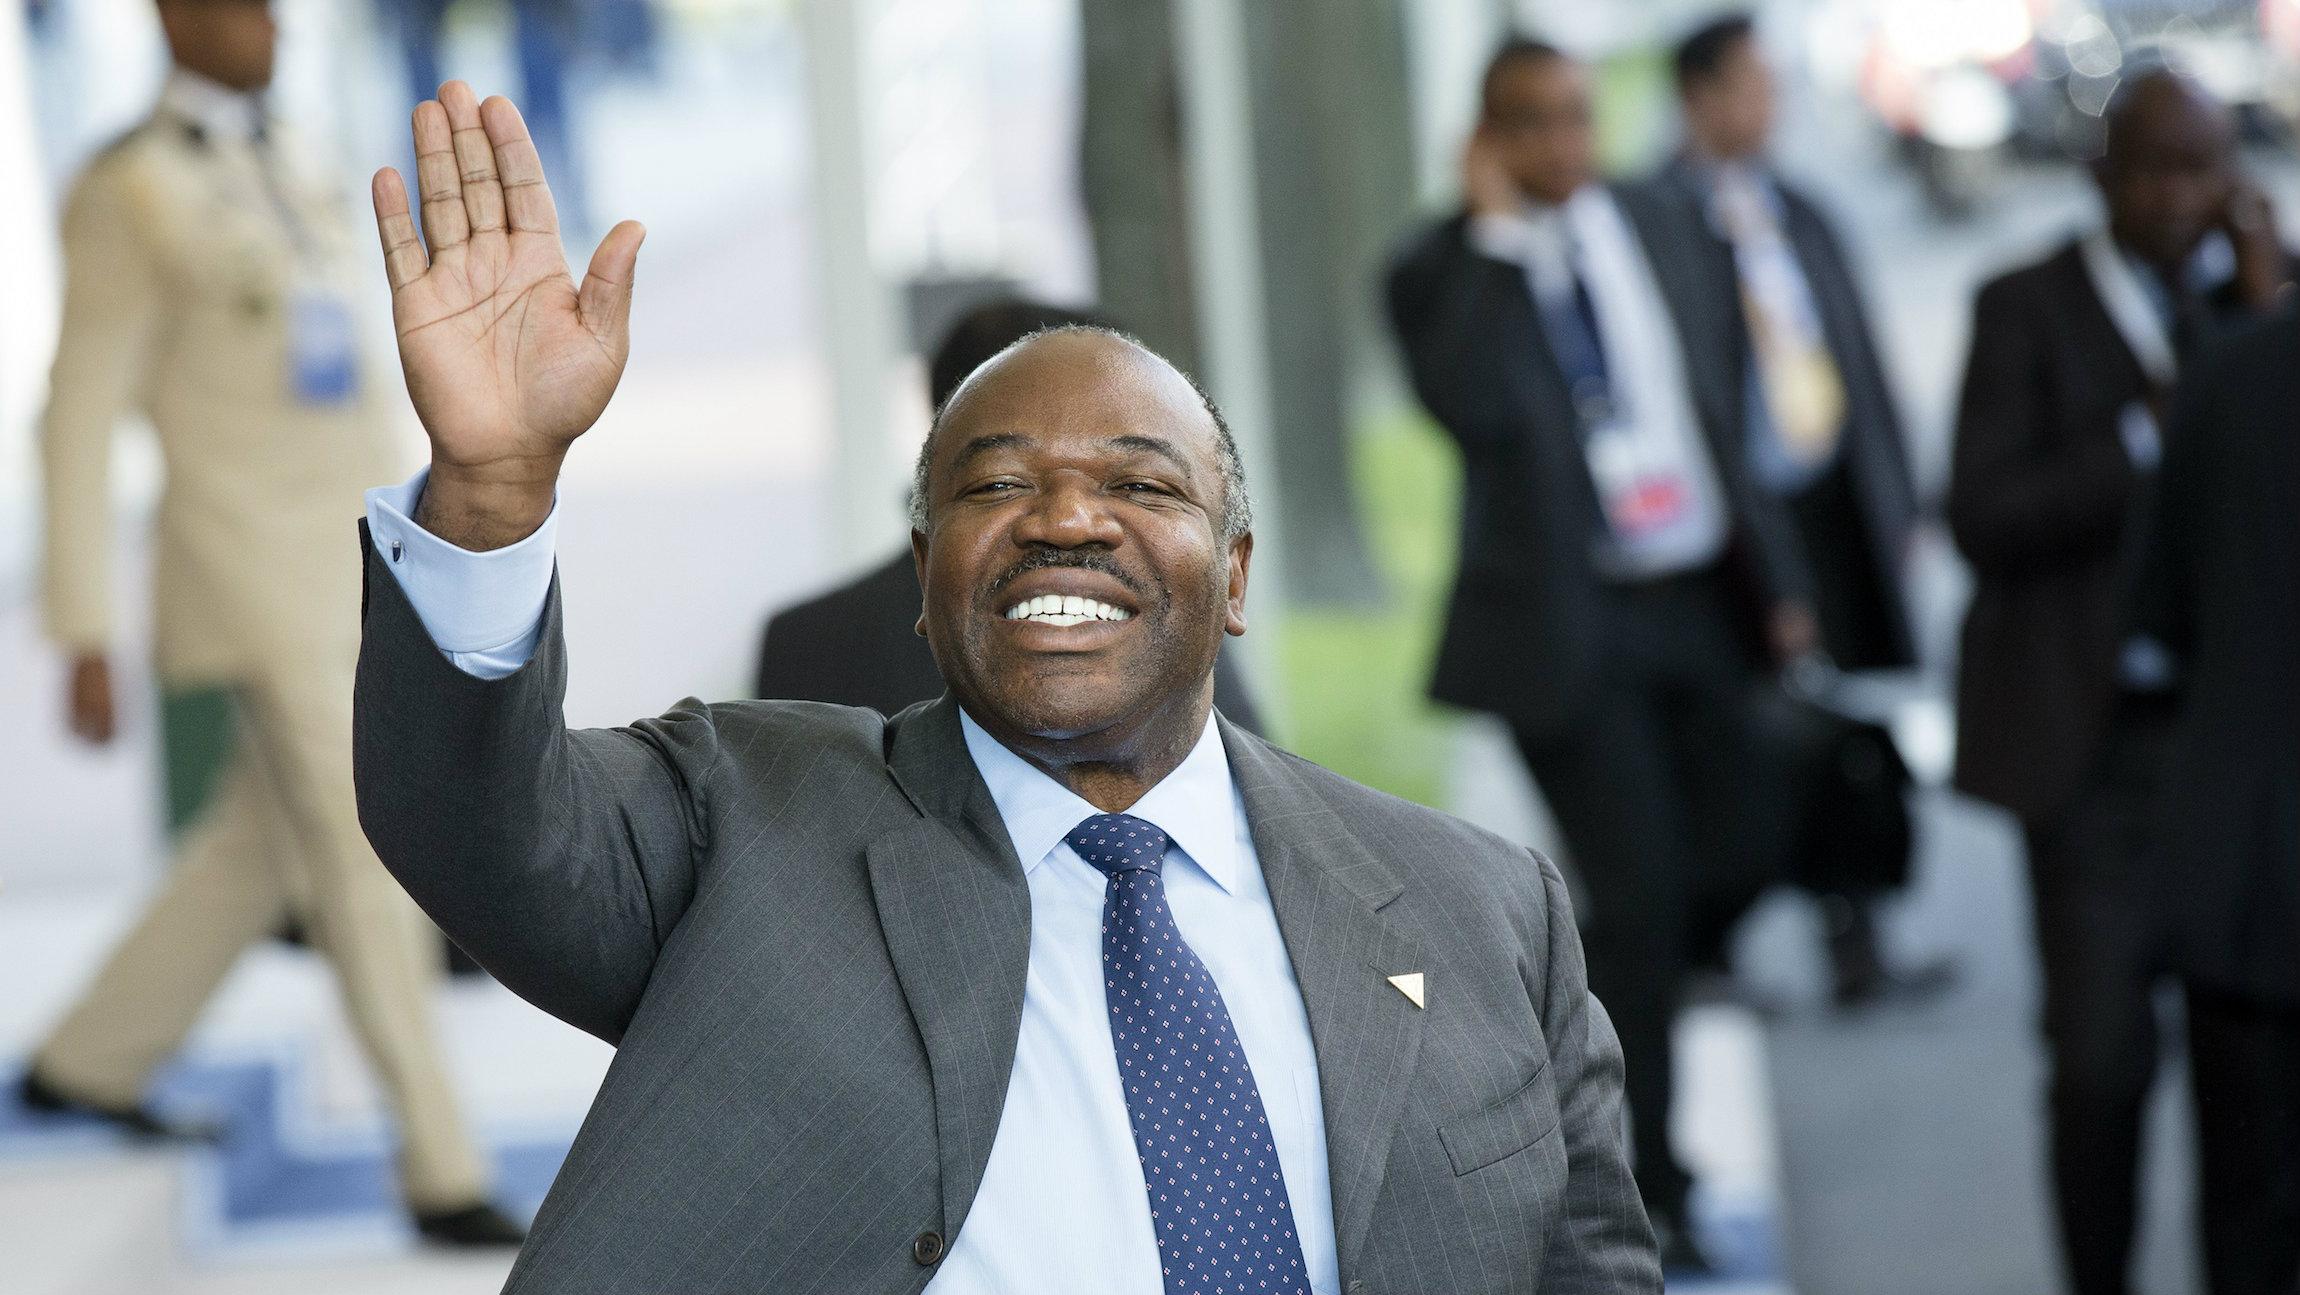 Ali Bongo Ondimba, president of Gabon pledges to give his inheritance to a youth foundation.